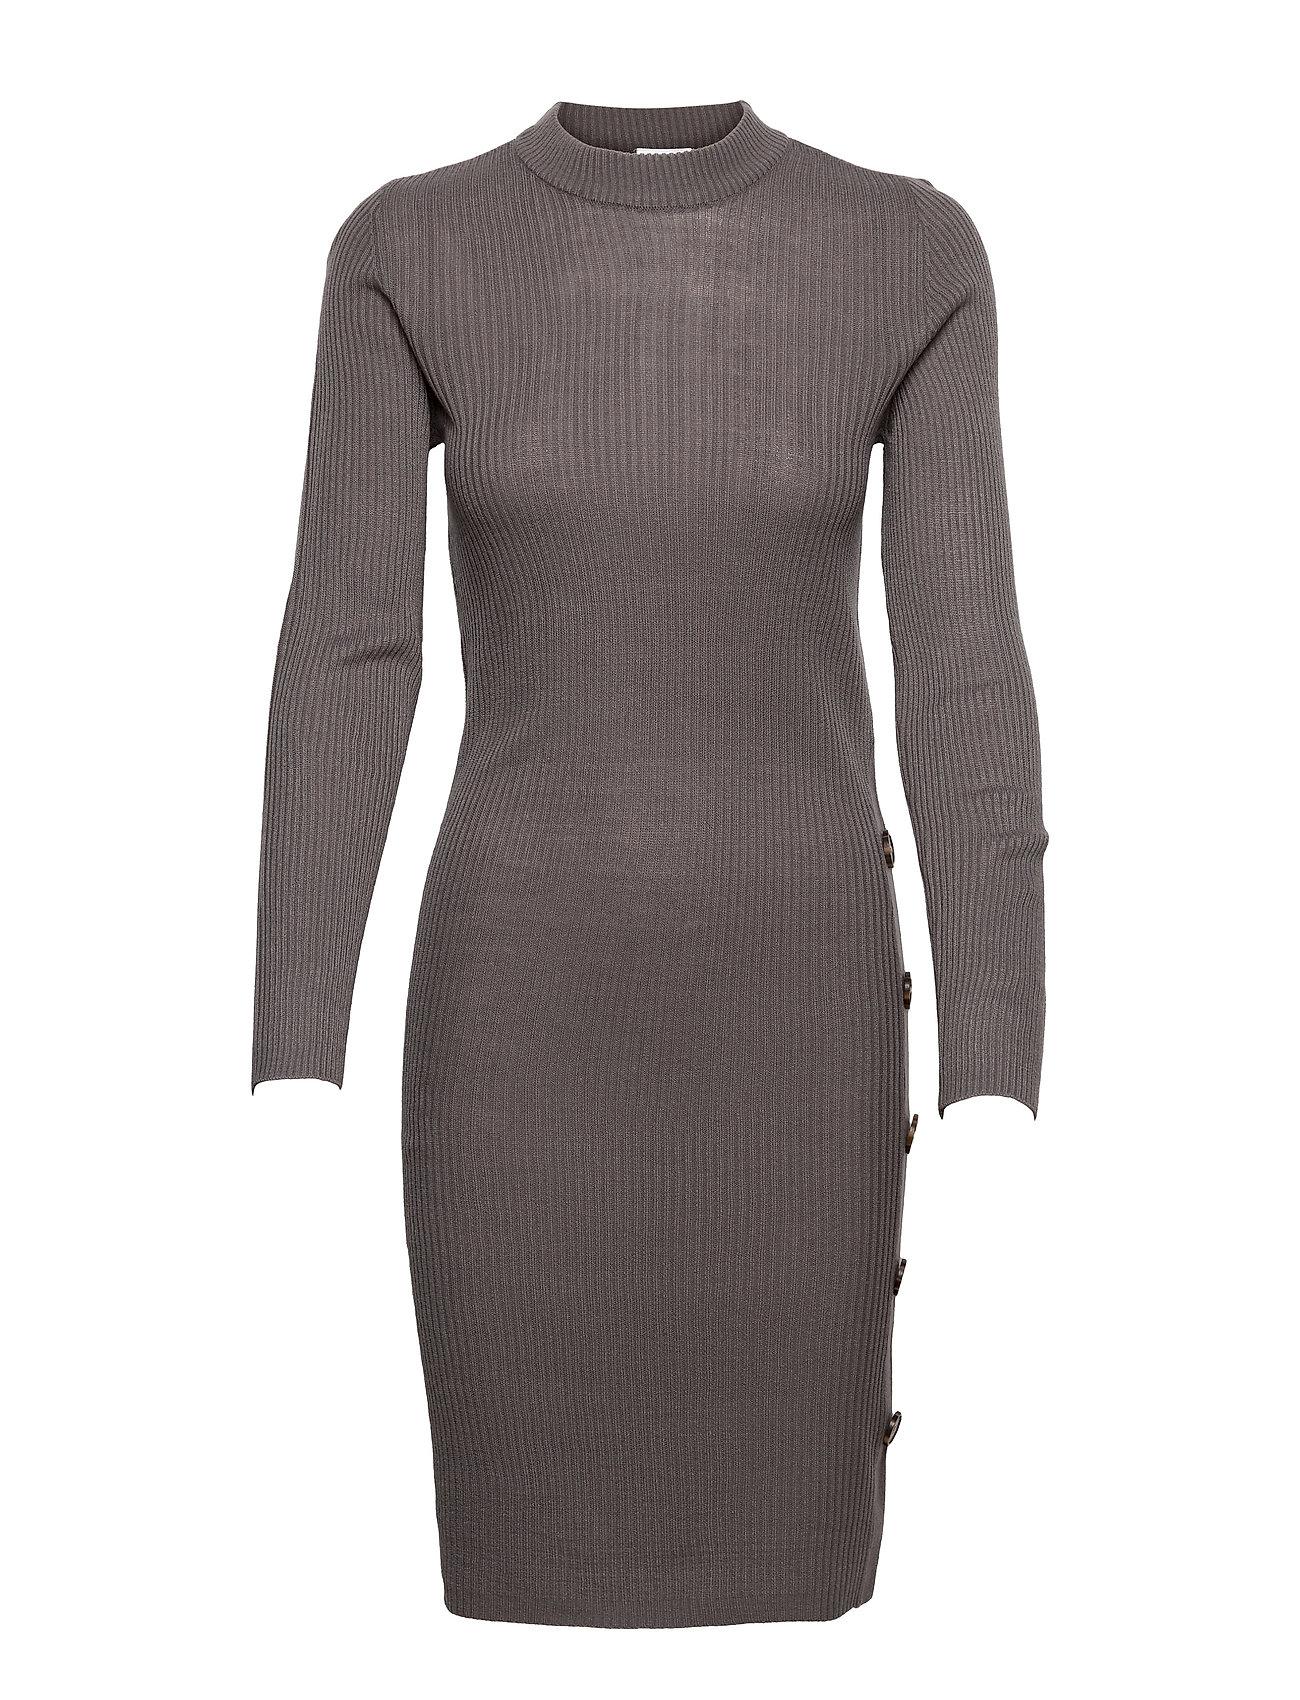 Vimegan L/S Bodycon Knit Dress/Ka Dresses Bodycon Dresses Grå Vila